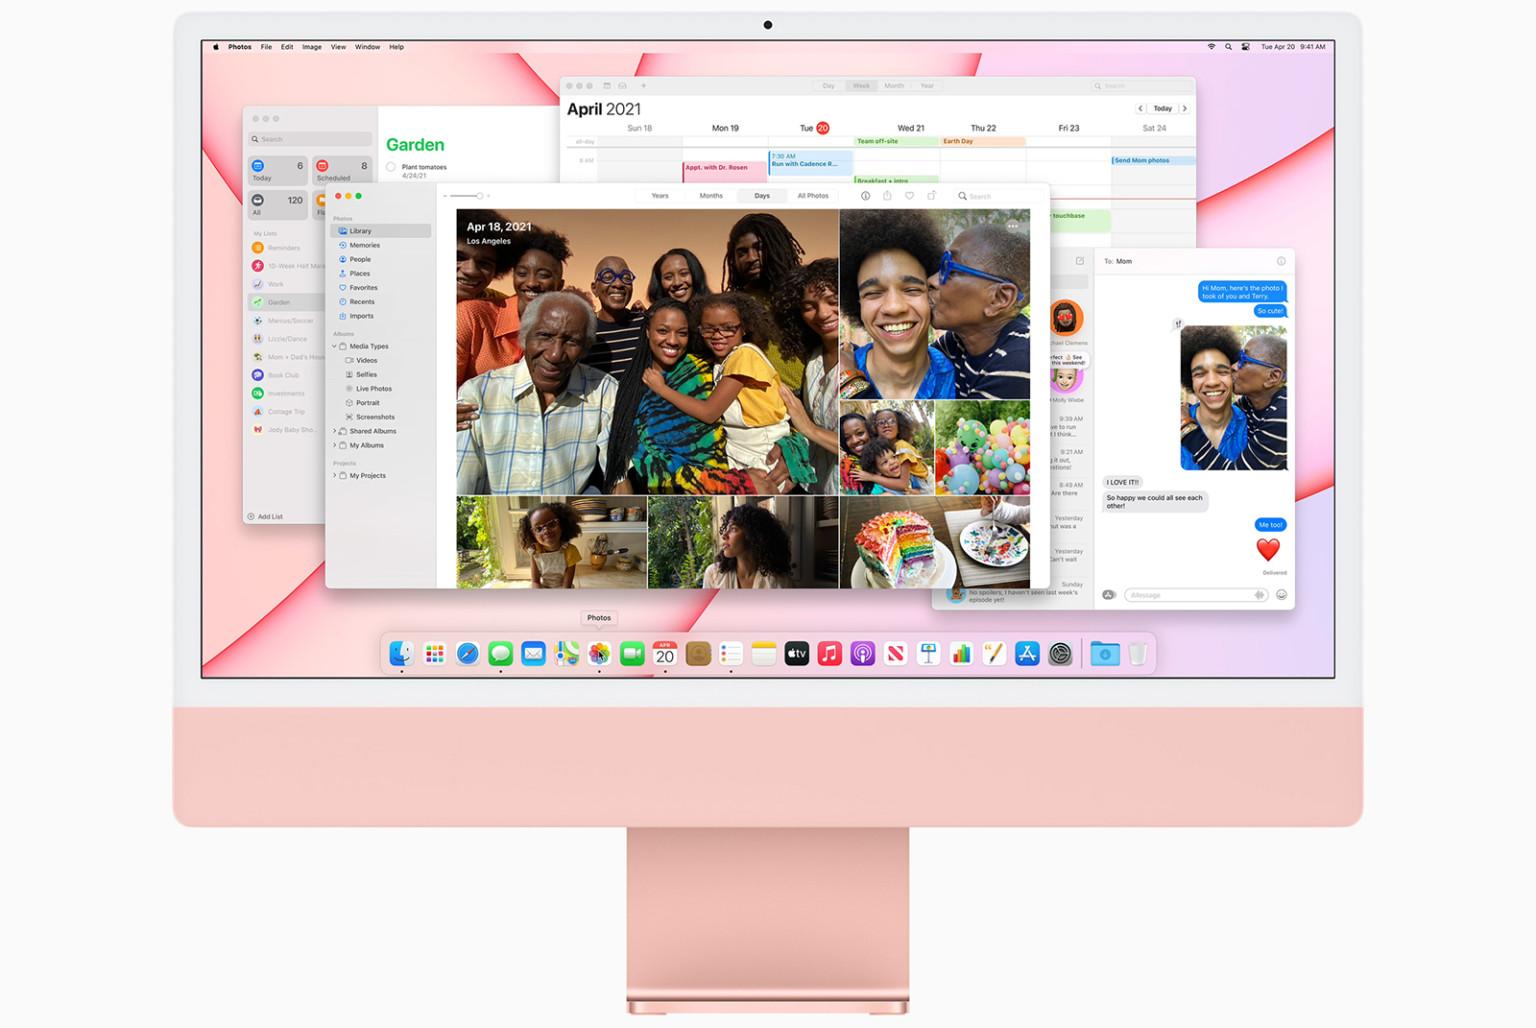 apple_new-imac-spring21_pf-red_04202021-1536x1028 - Copy.jpg